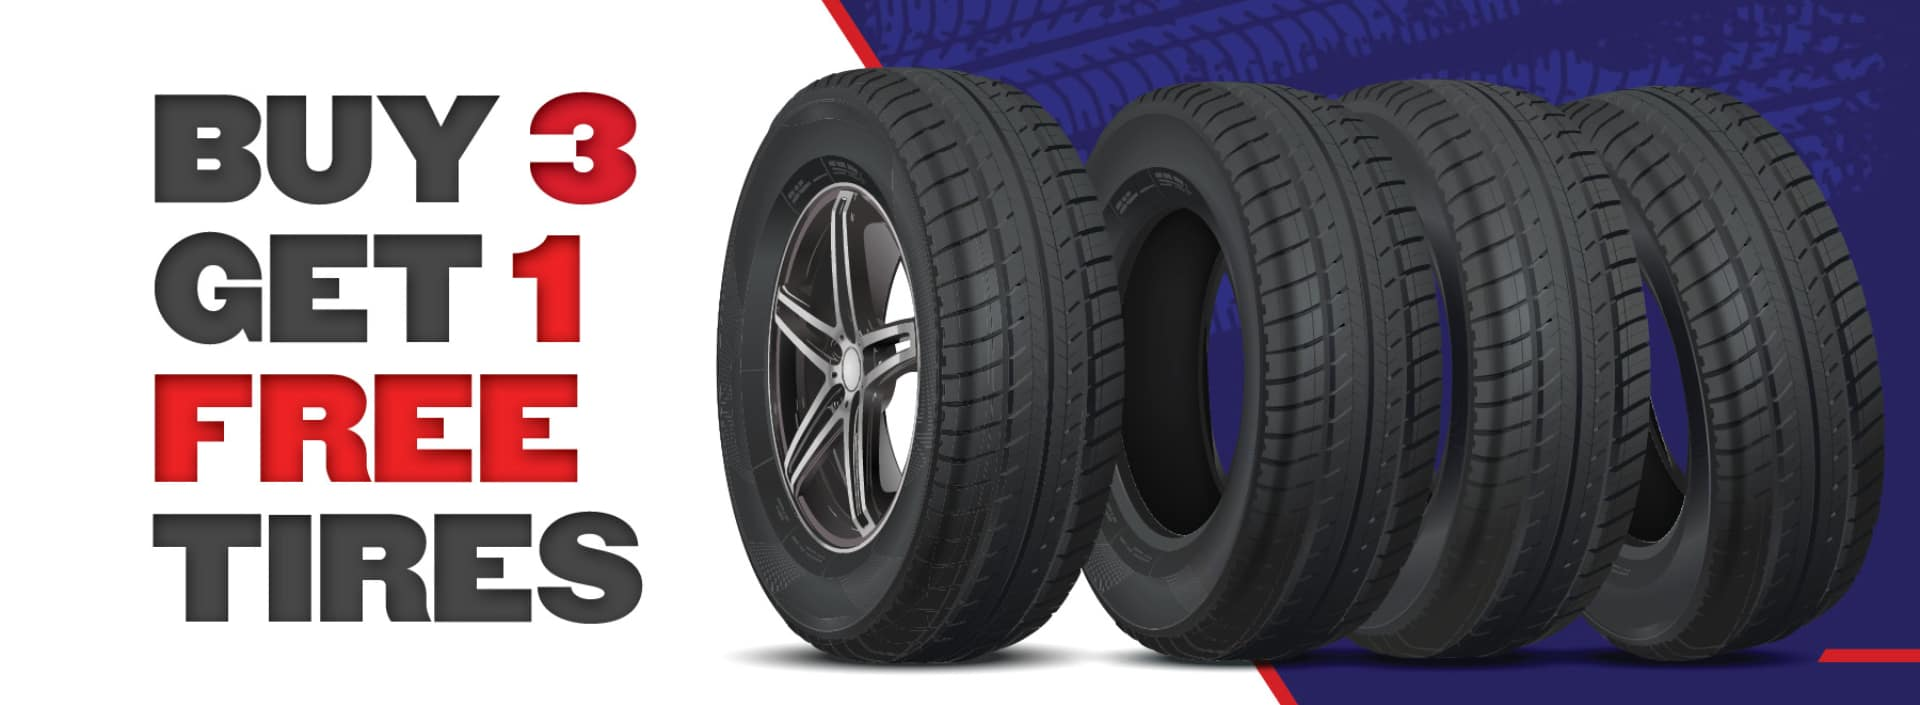 CDJR Tires